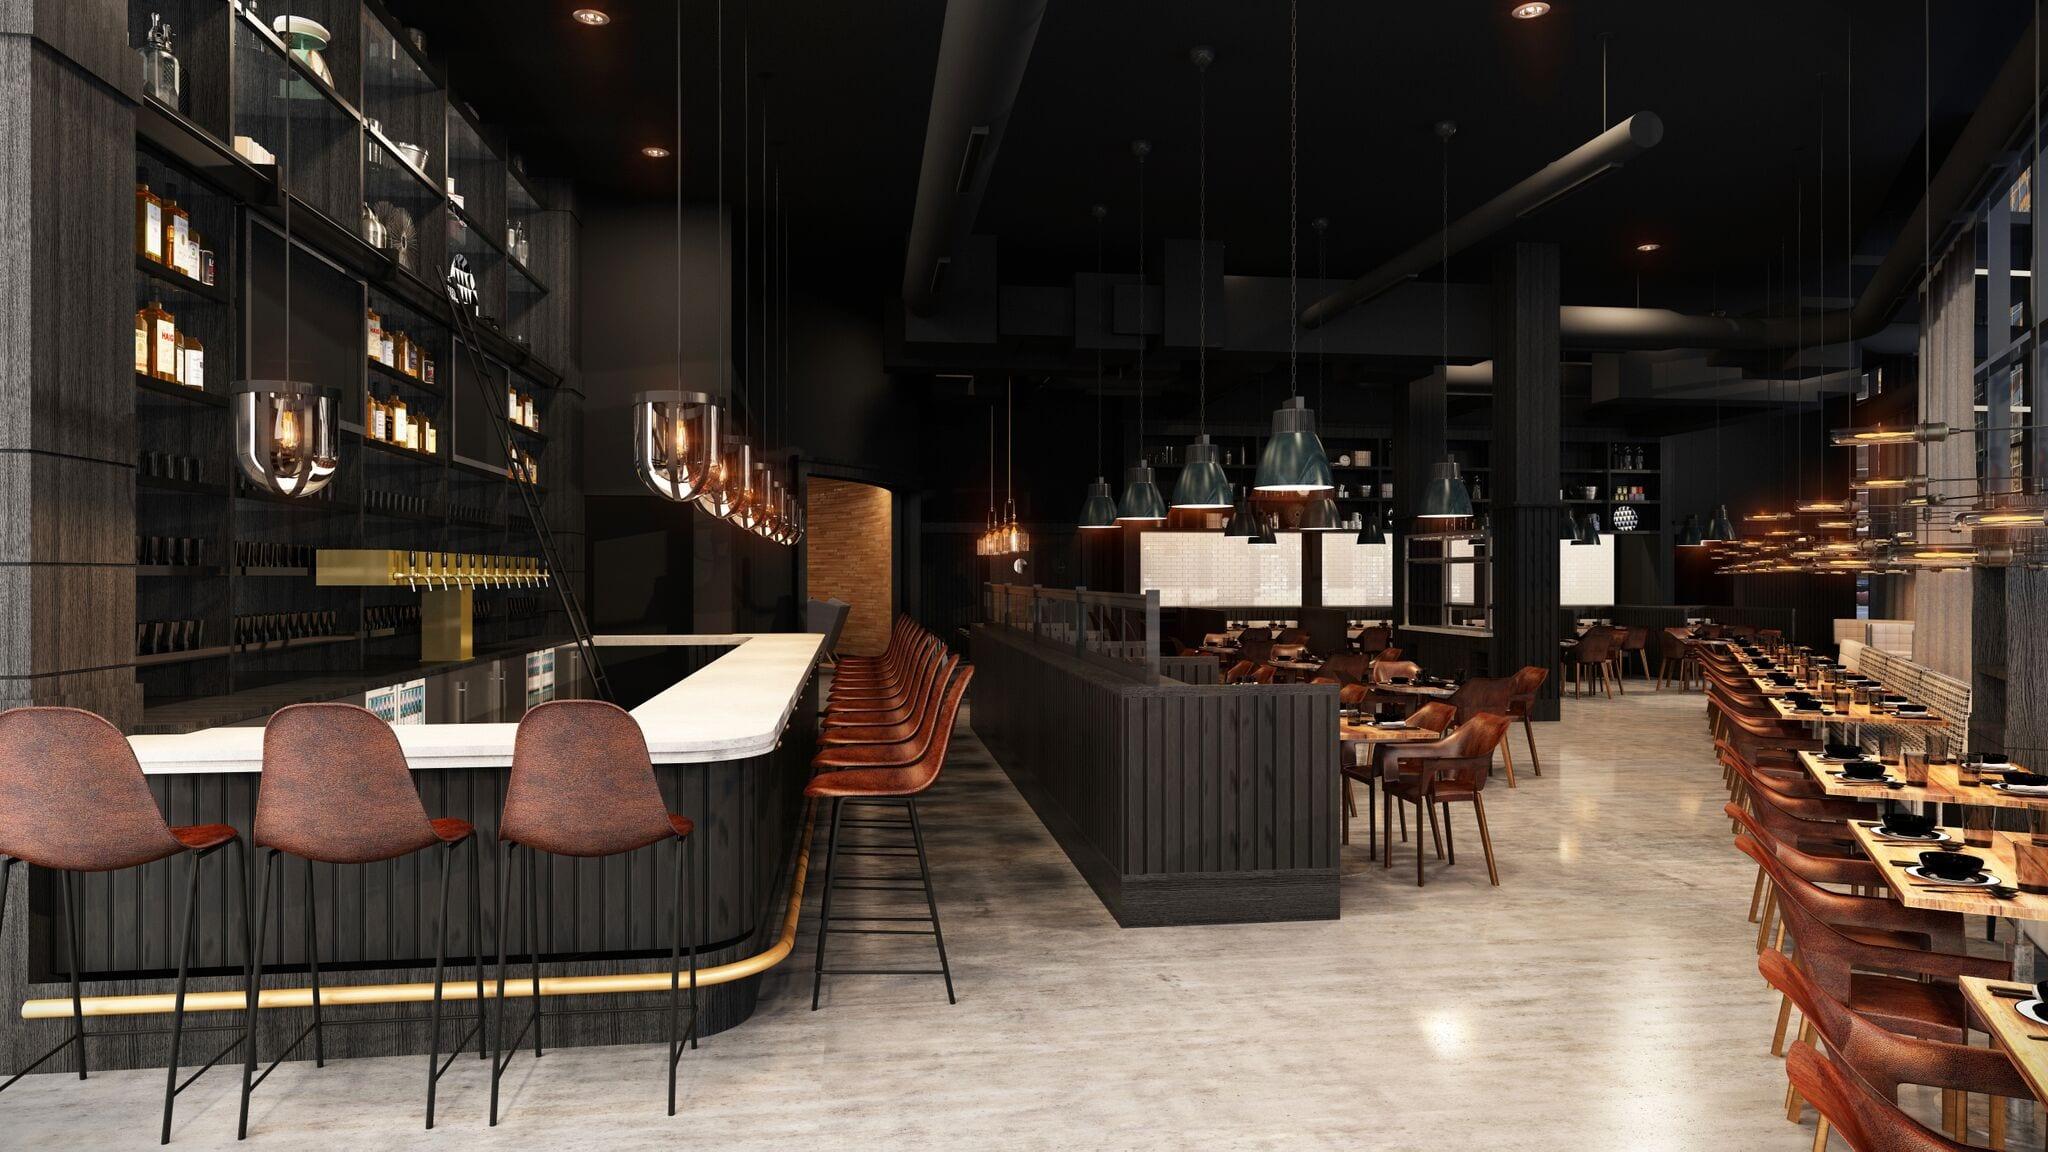 Hotel Indigo's dining and lounge area